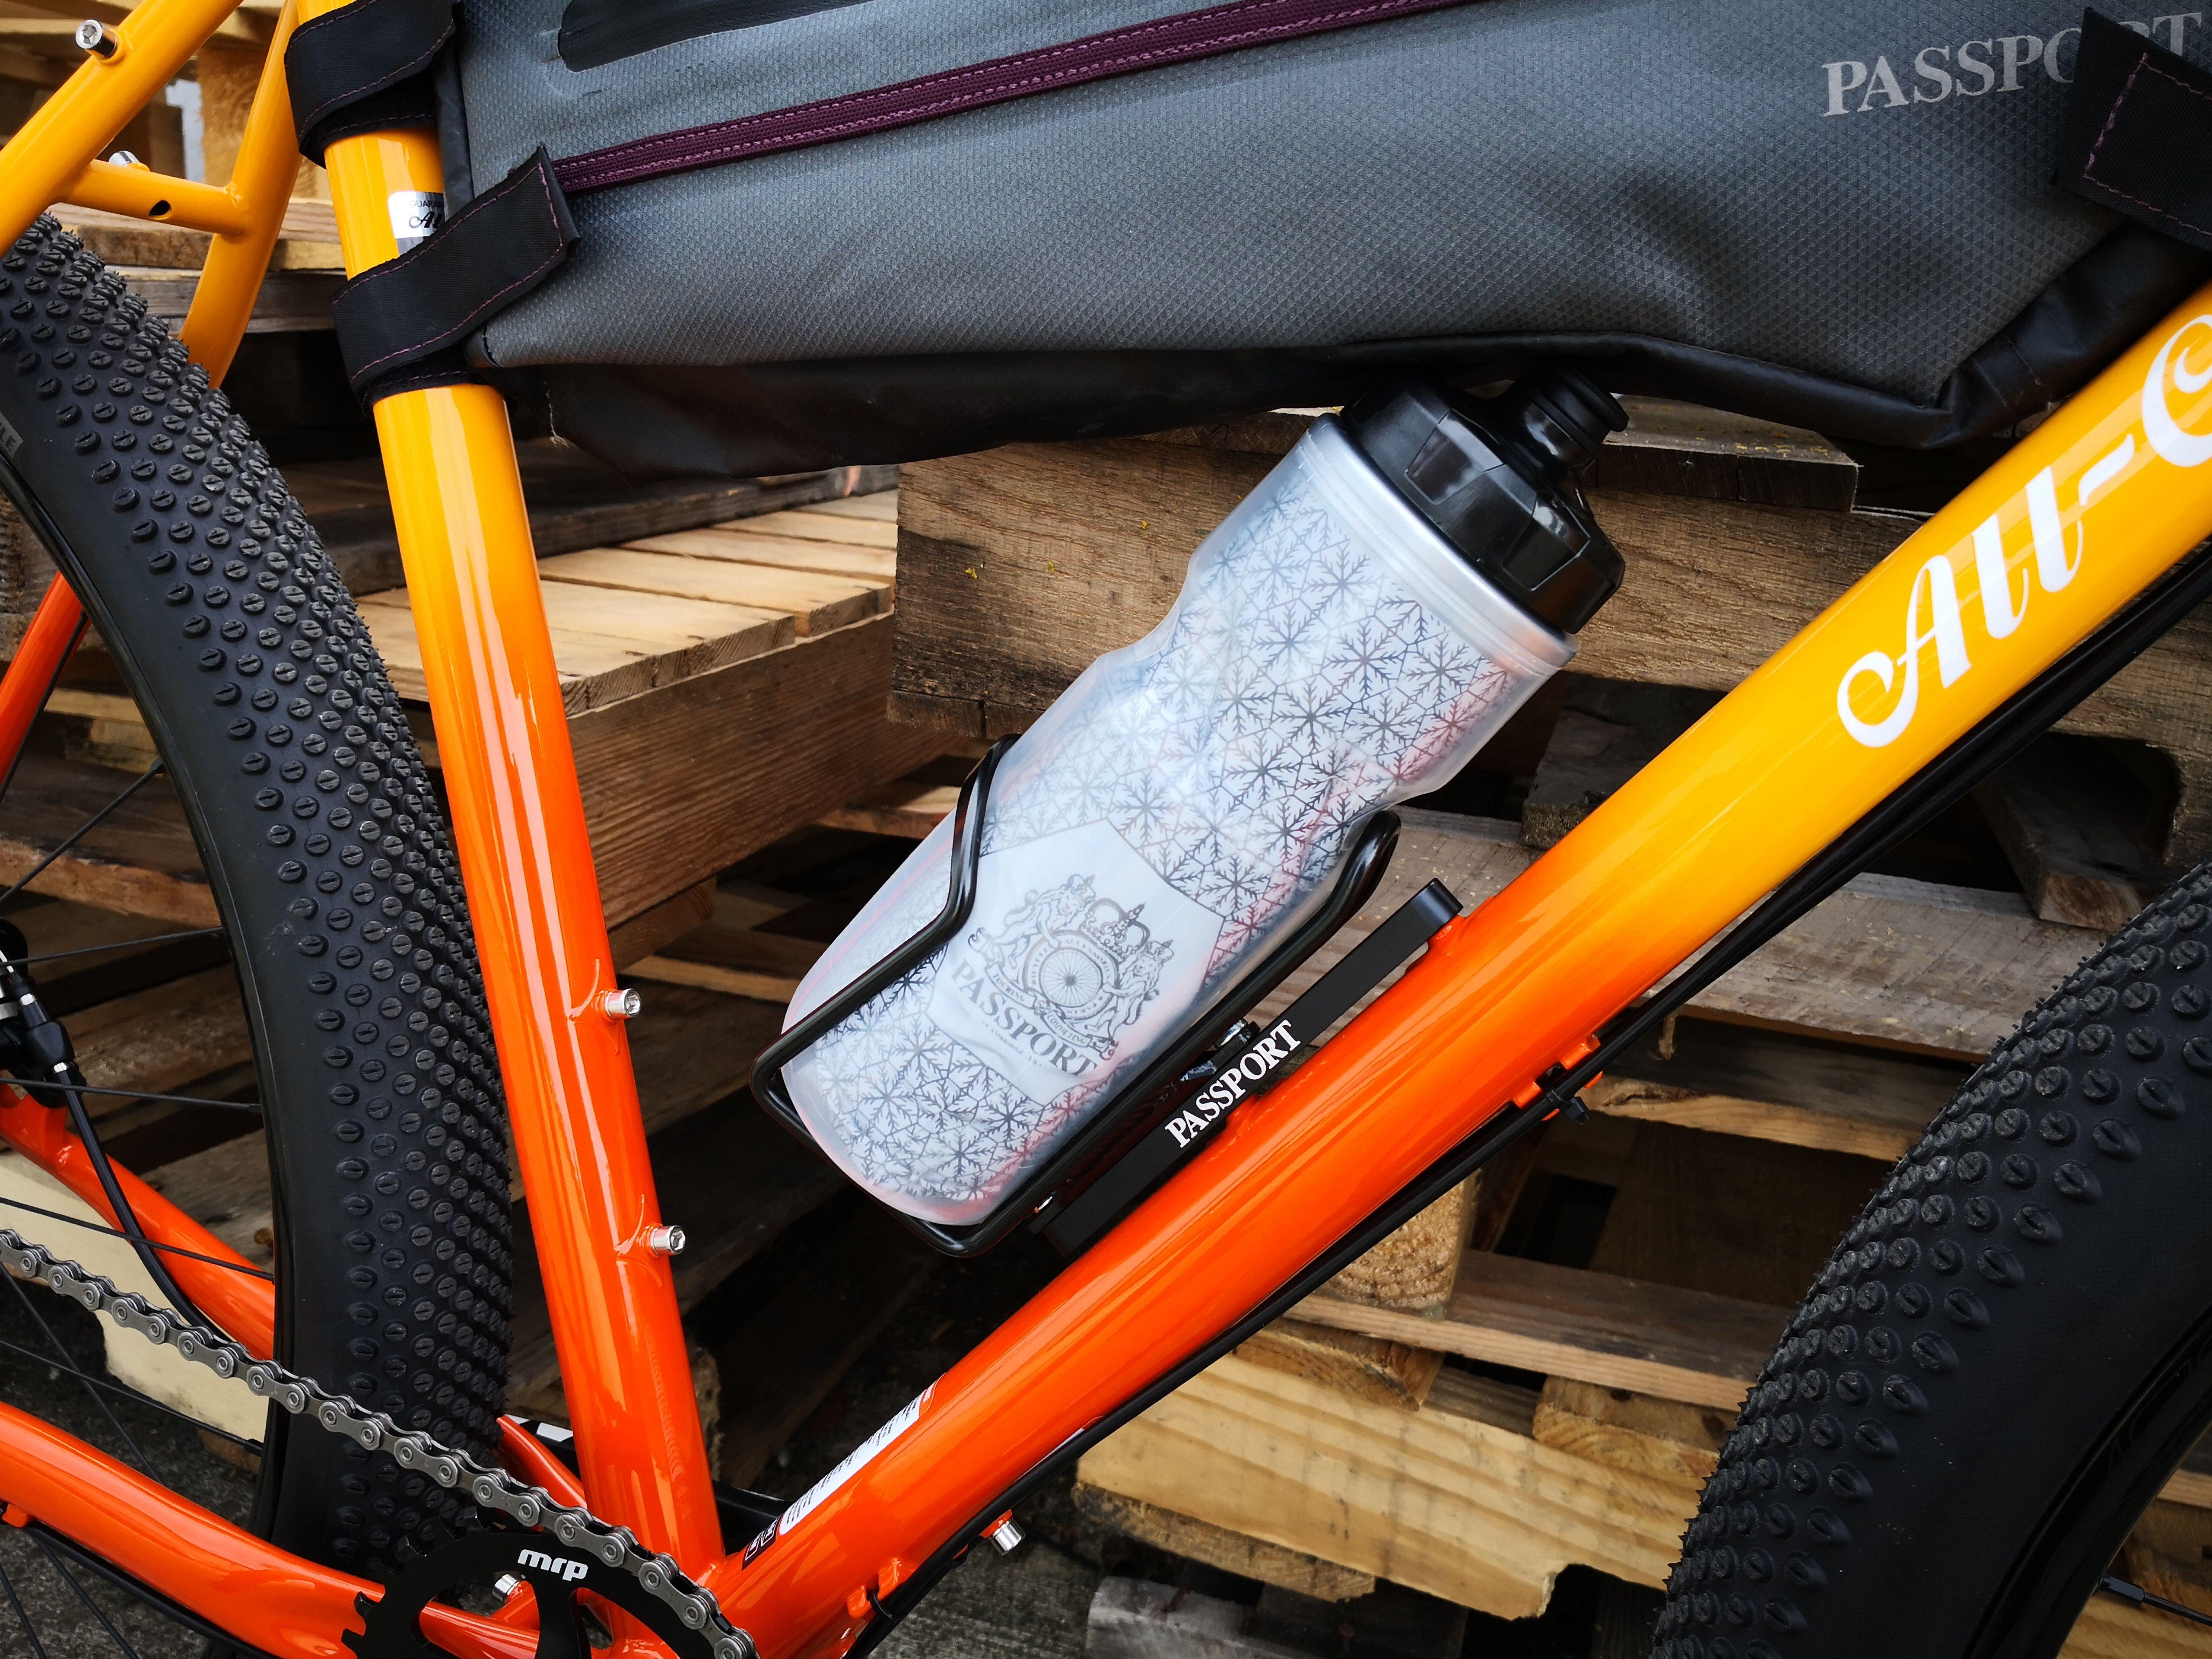 NEWS: New UK Spec Surly & All-City bikes - ADVNTR